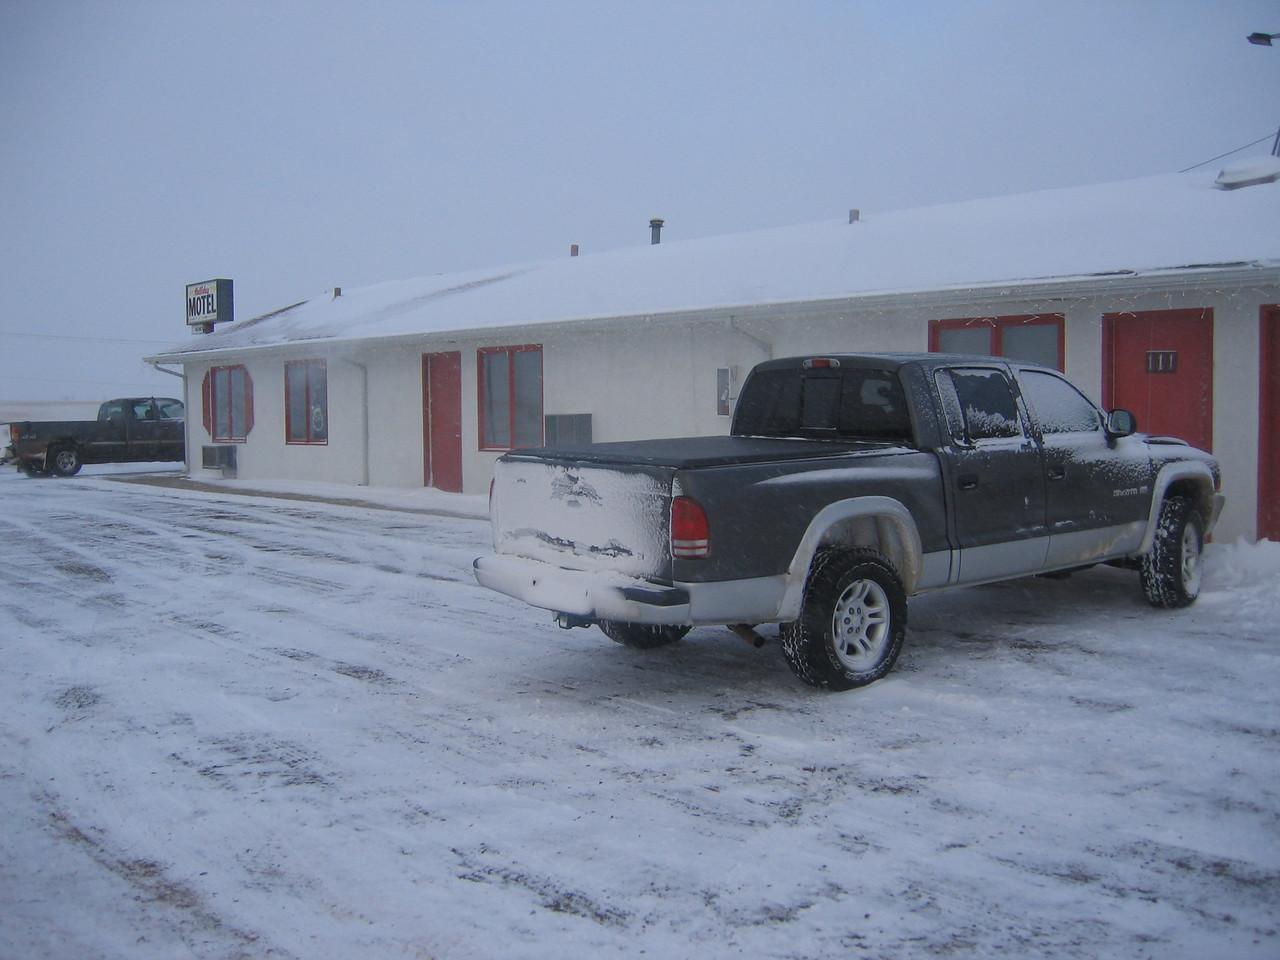 The Halliday motel